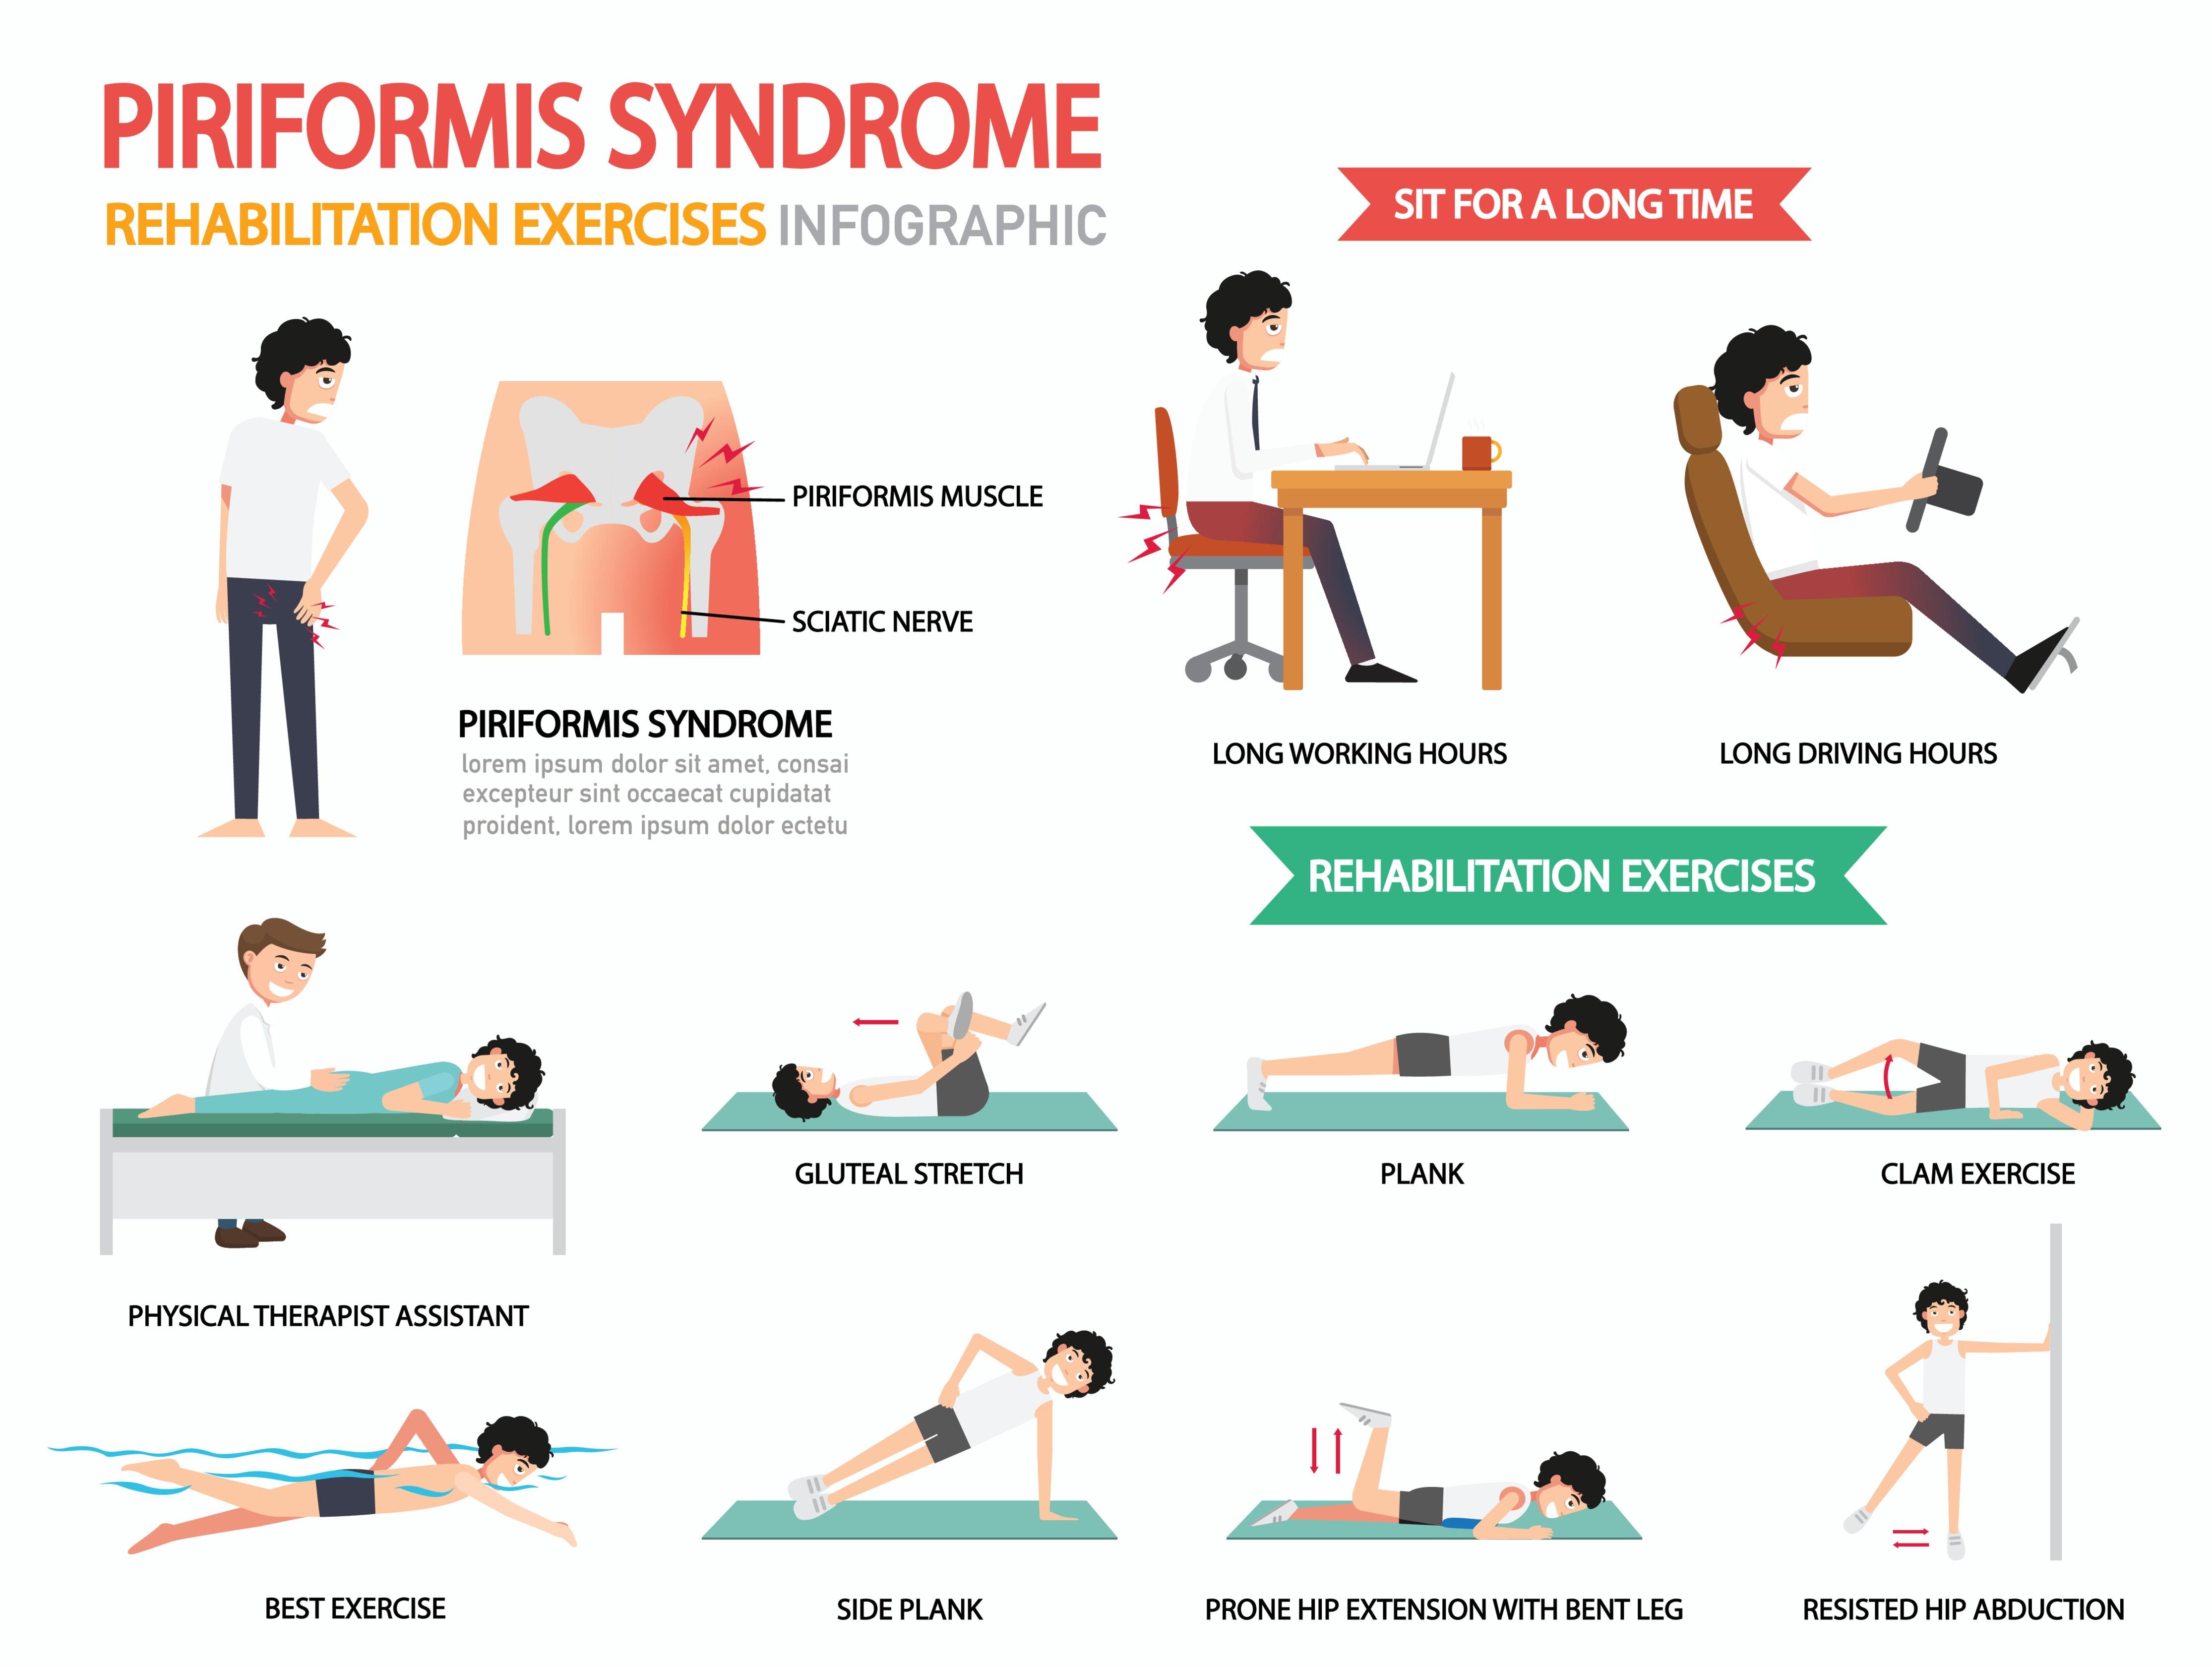 piriformis syndrome rehabilitation exercises infographic